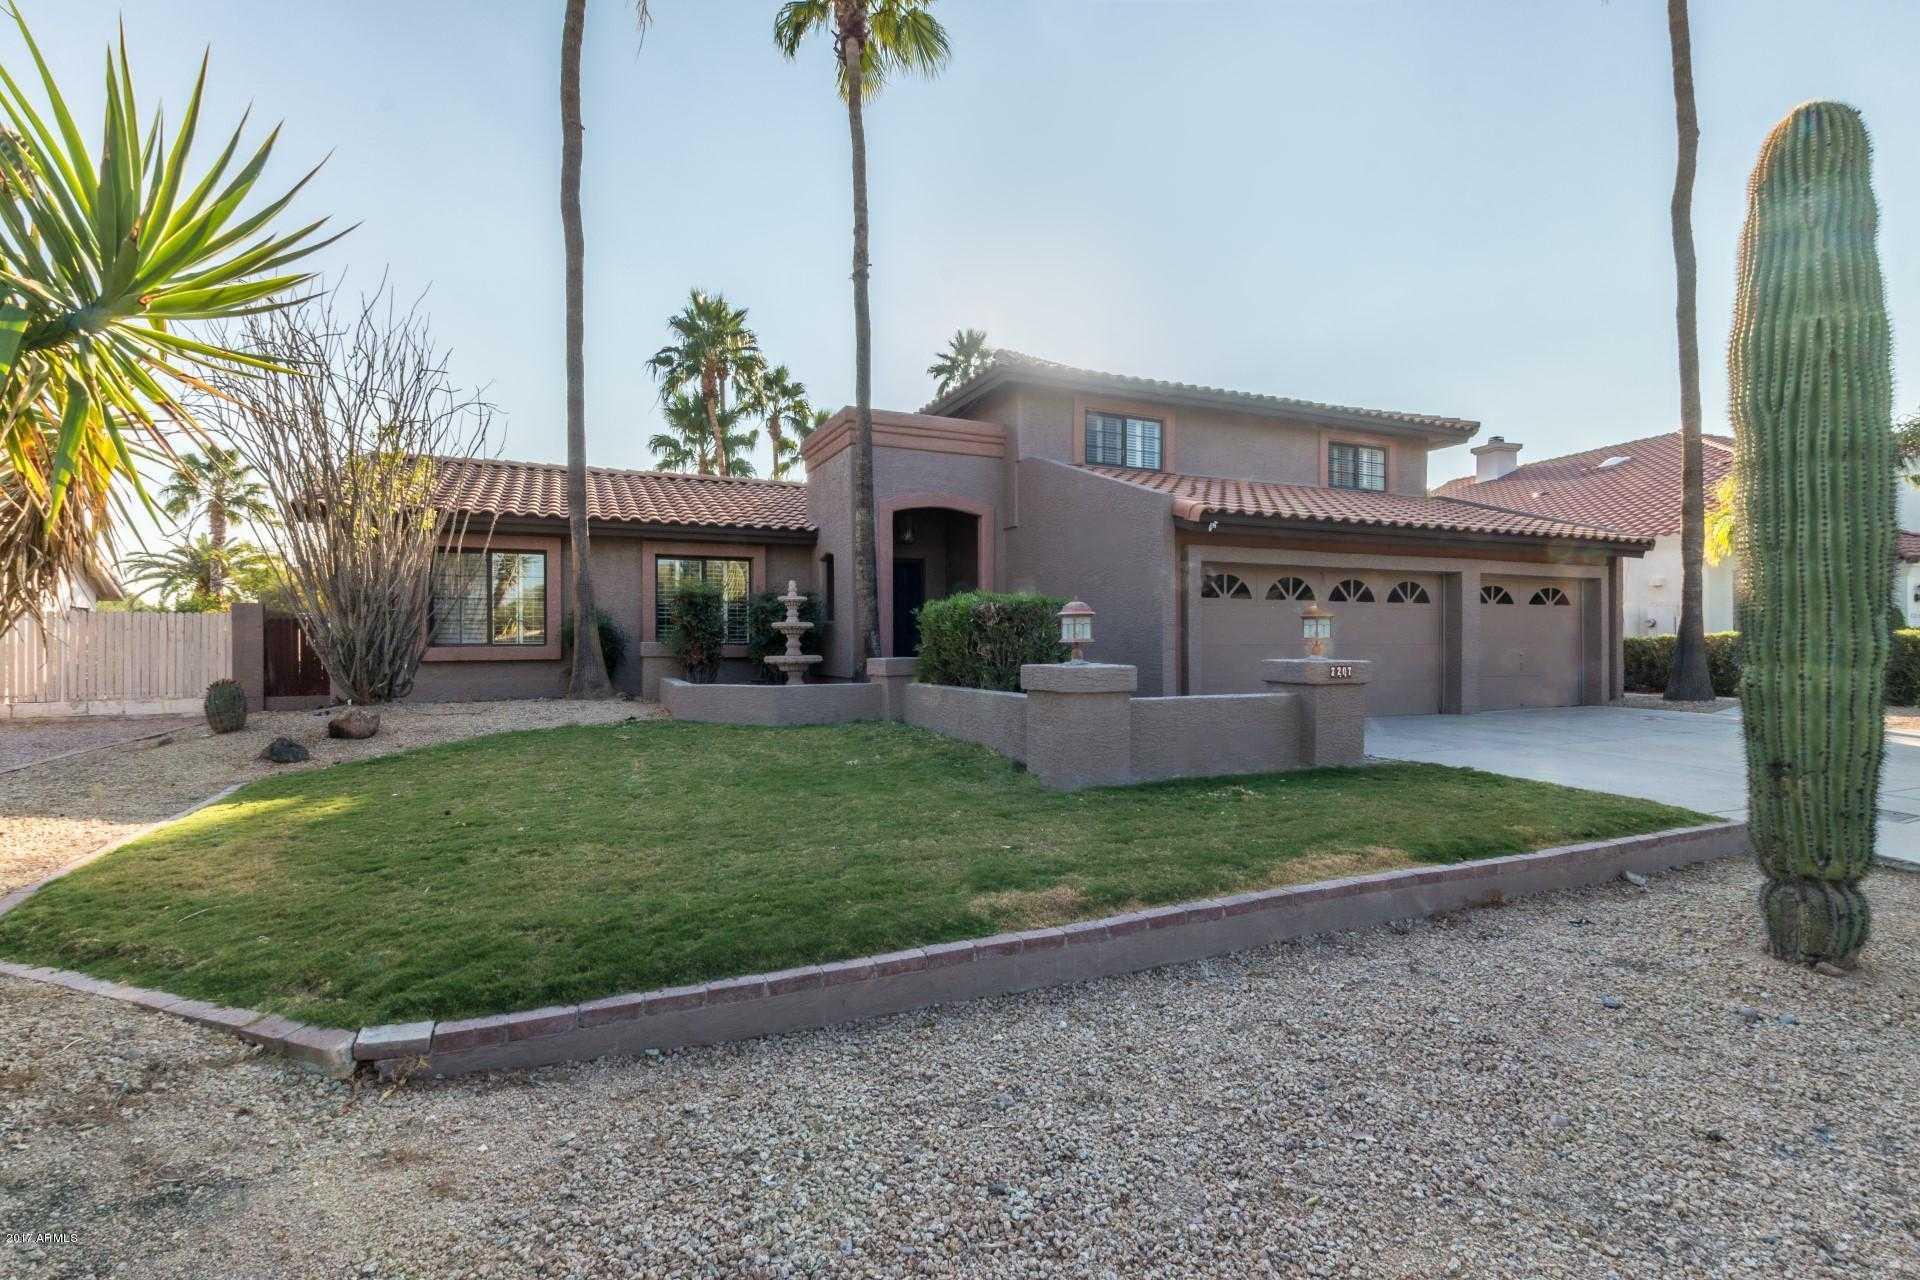 $400,000 - 4Br/3Ba - Home for Sale in Arrowhead Oasis Amd Lt 1-88 Tr, Glendale